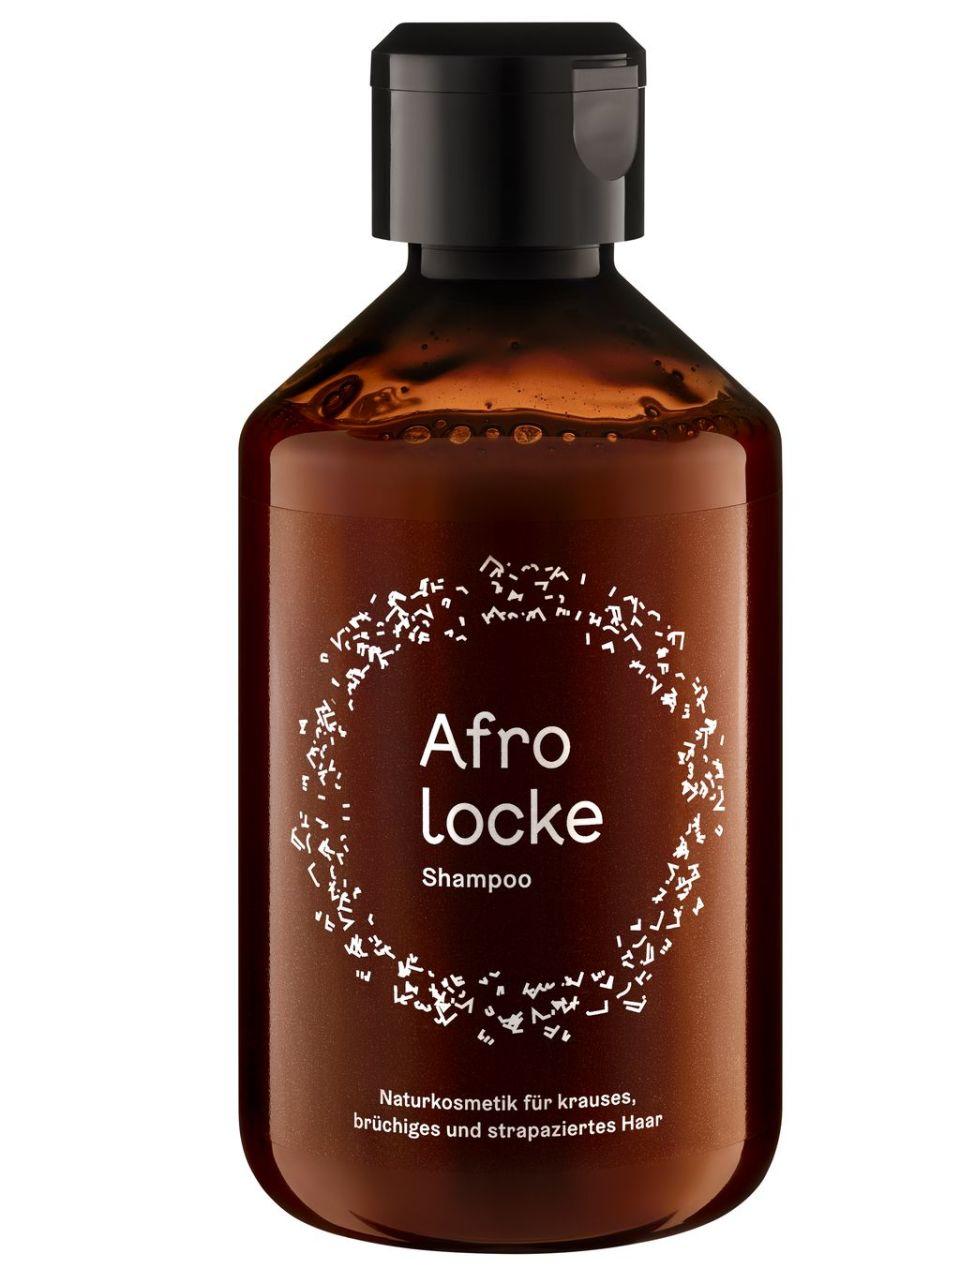 Afrolocke Shampoo / Lockenpflege Shampoo